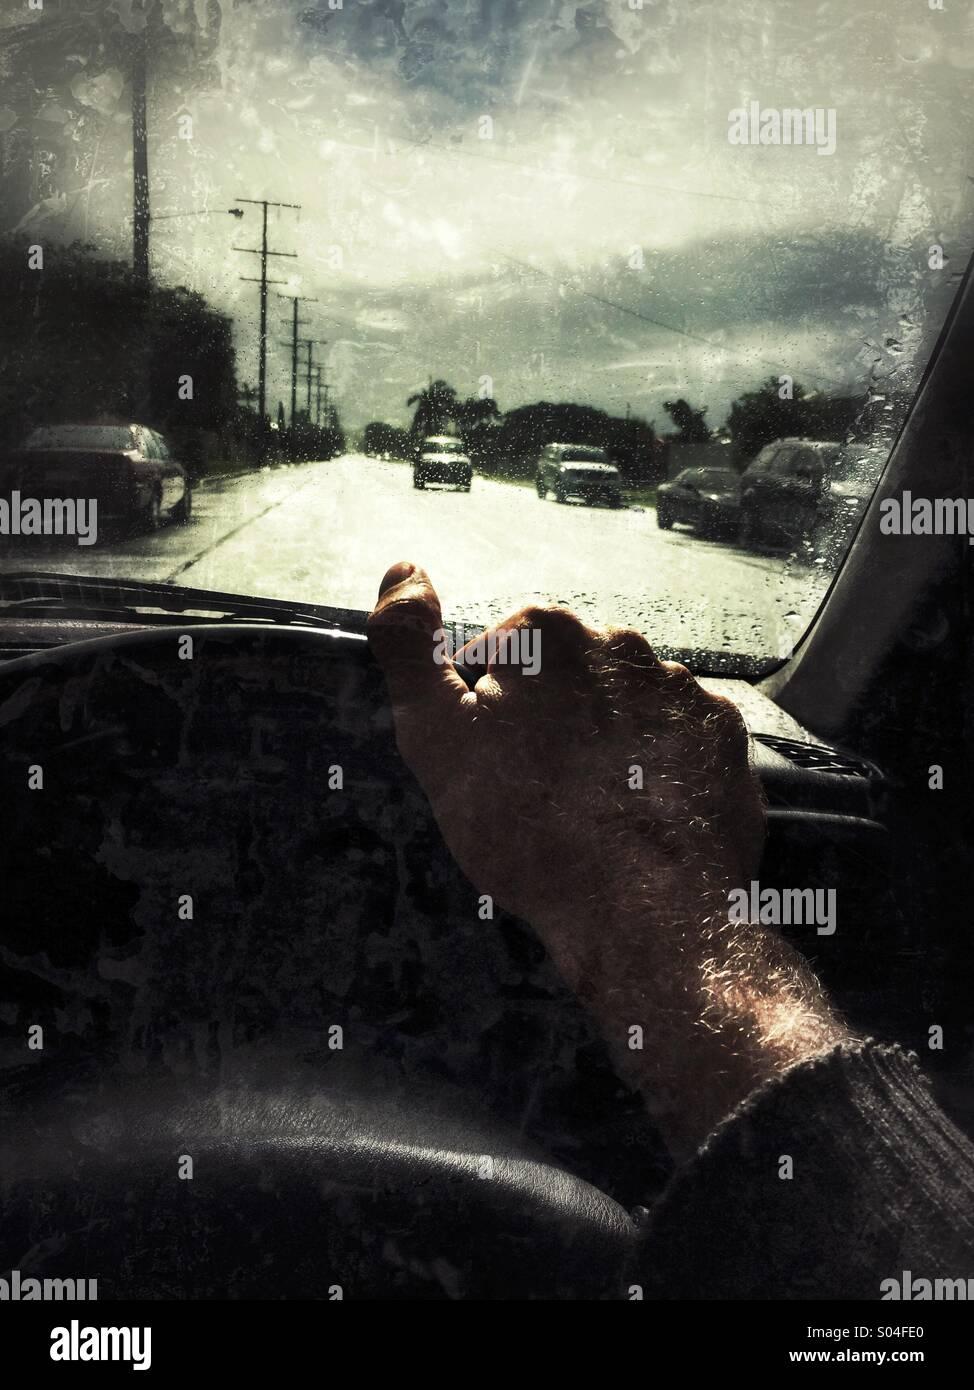 Sicht des Fahrers Stockbild